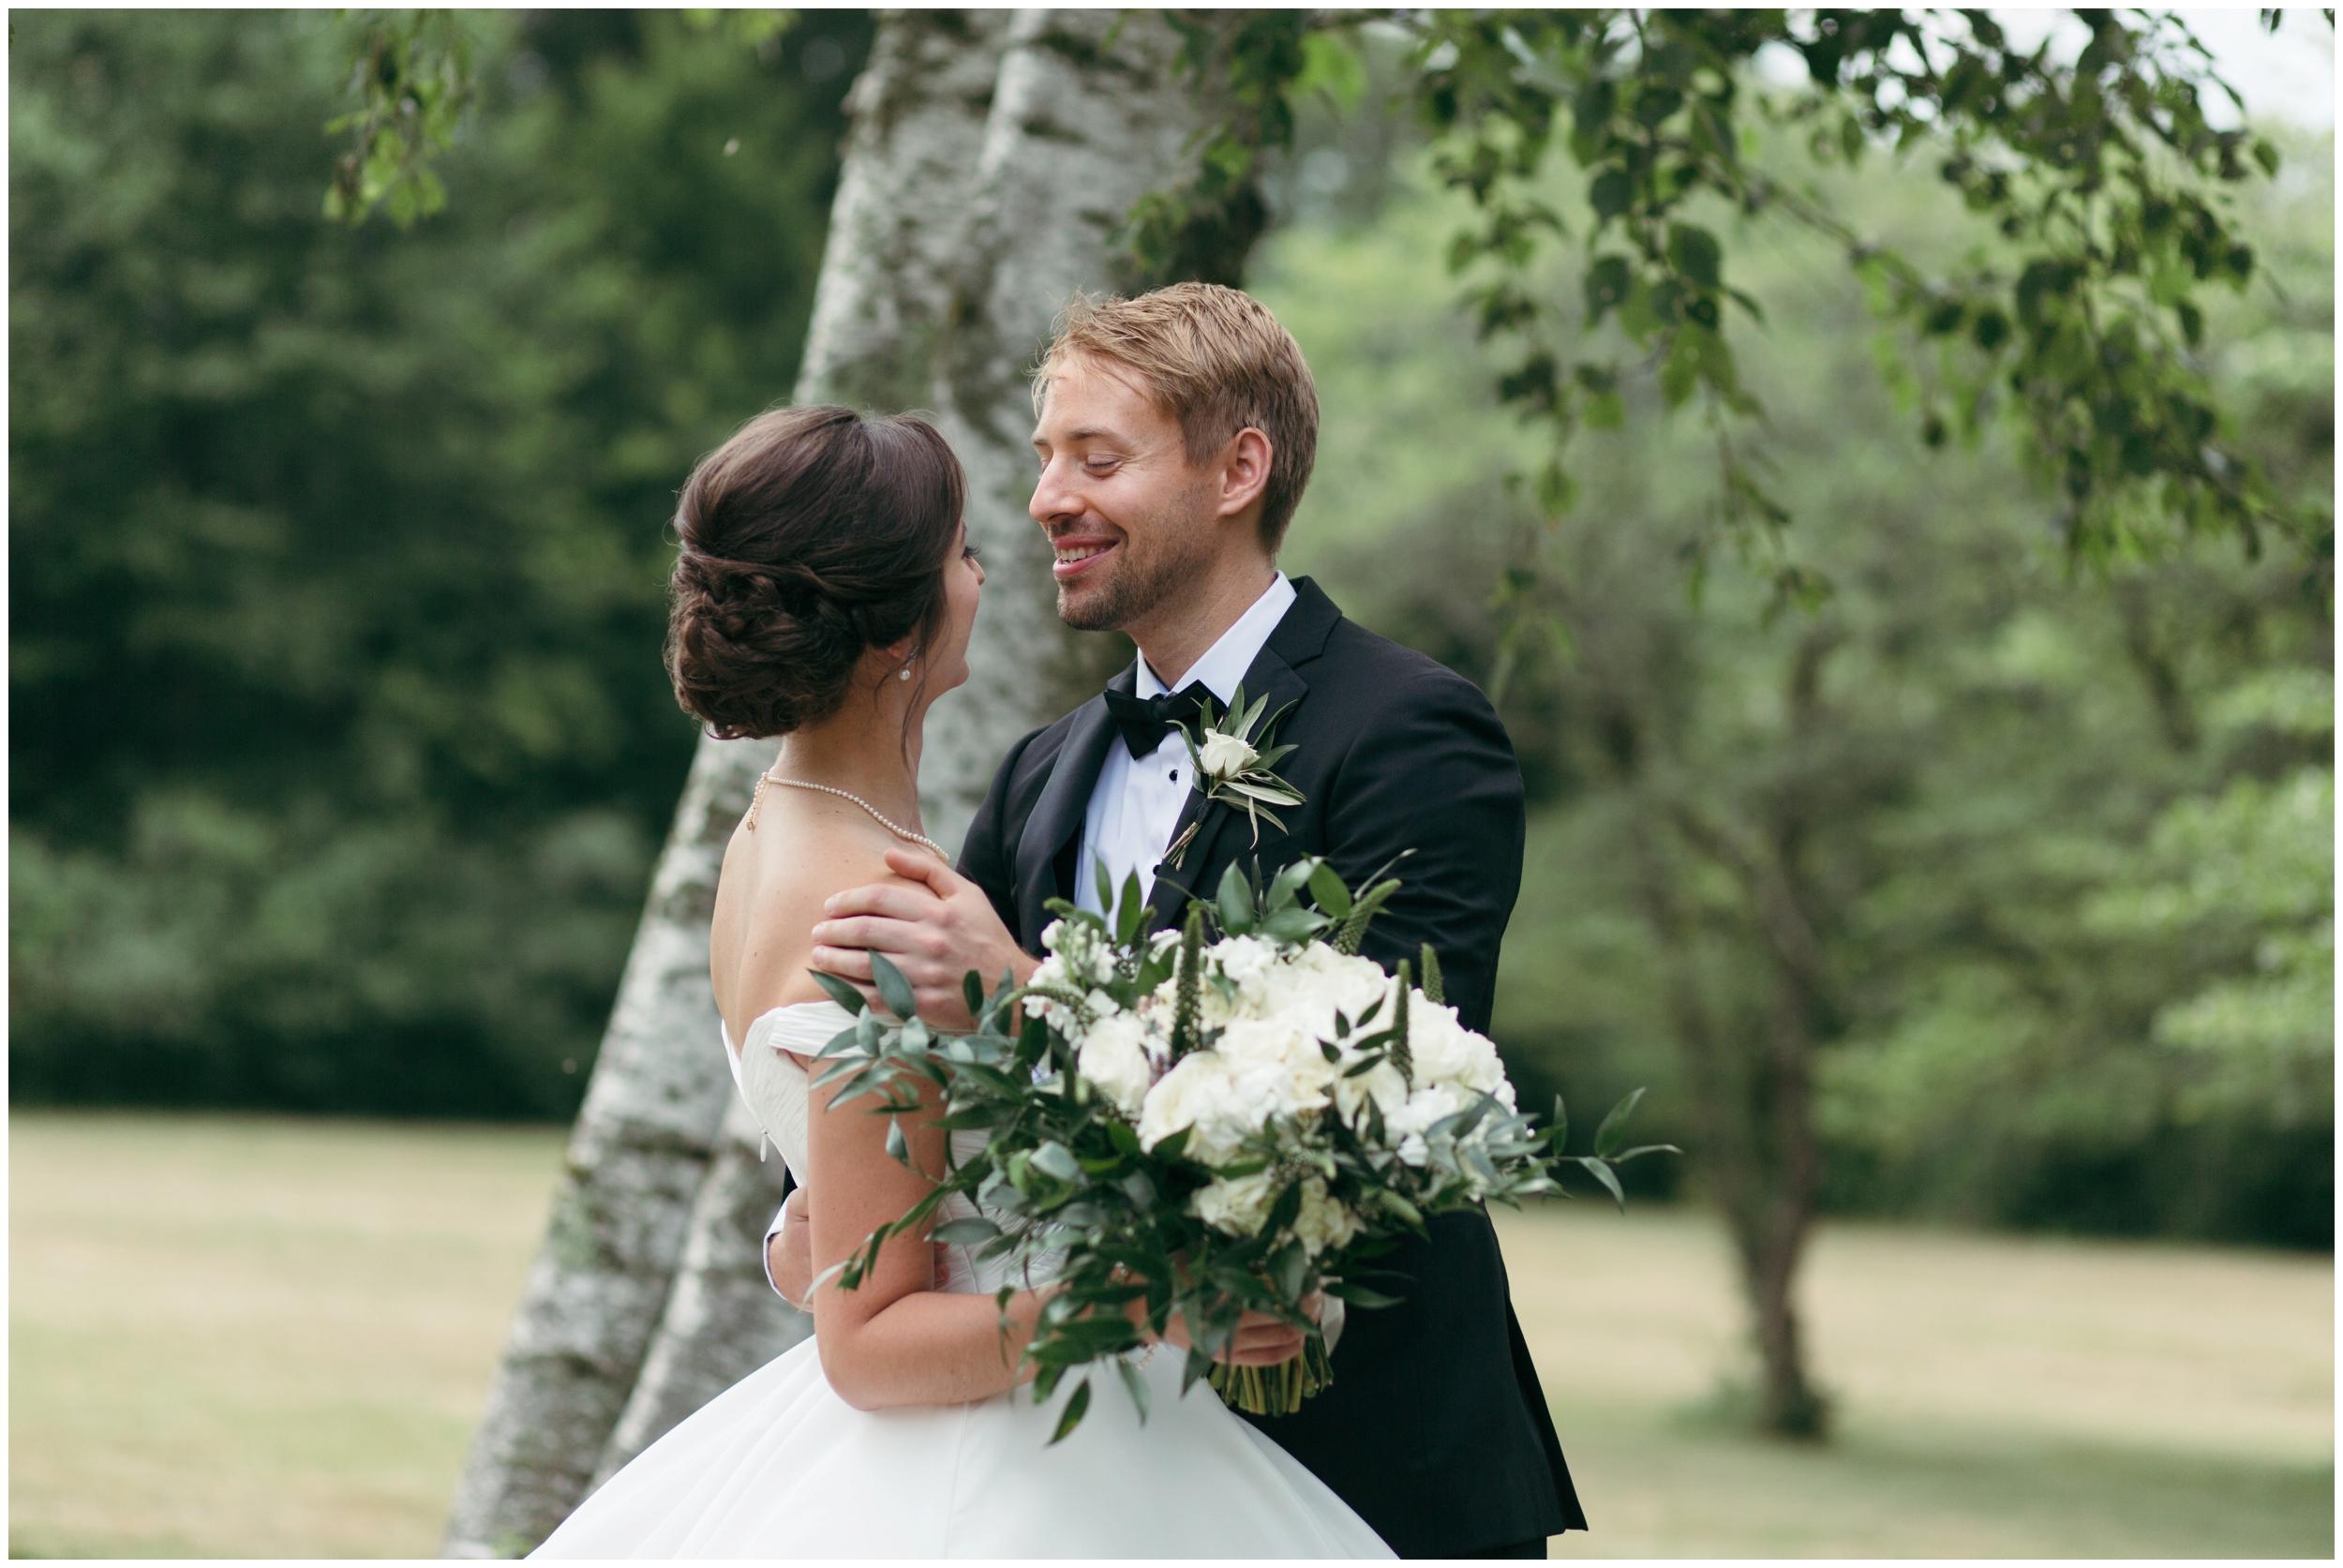 Willowdale-Estate-Wedding-Bailey-Q-Photo-Boston-Wedding-Photographer-010.JPG